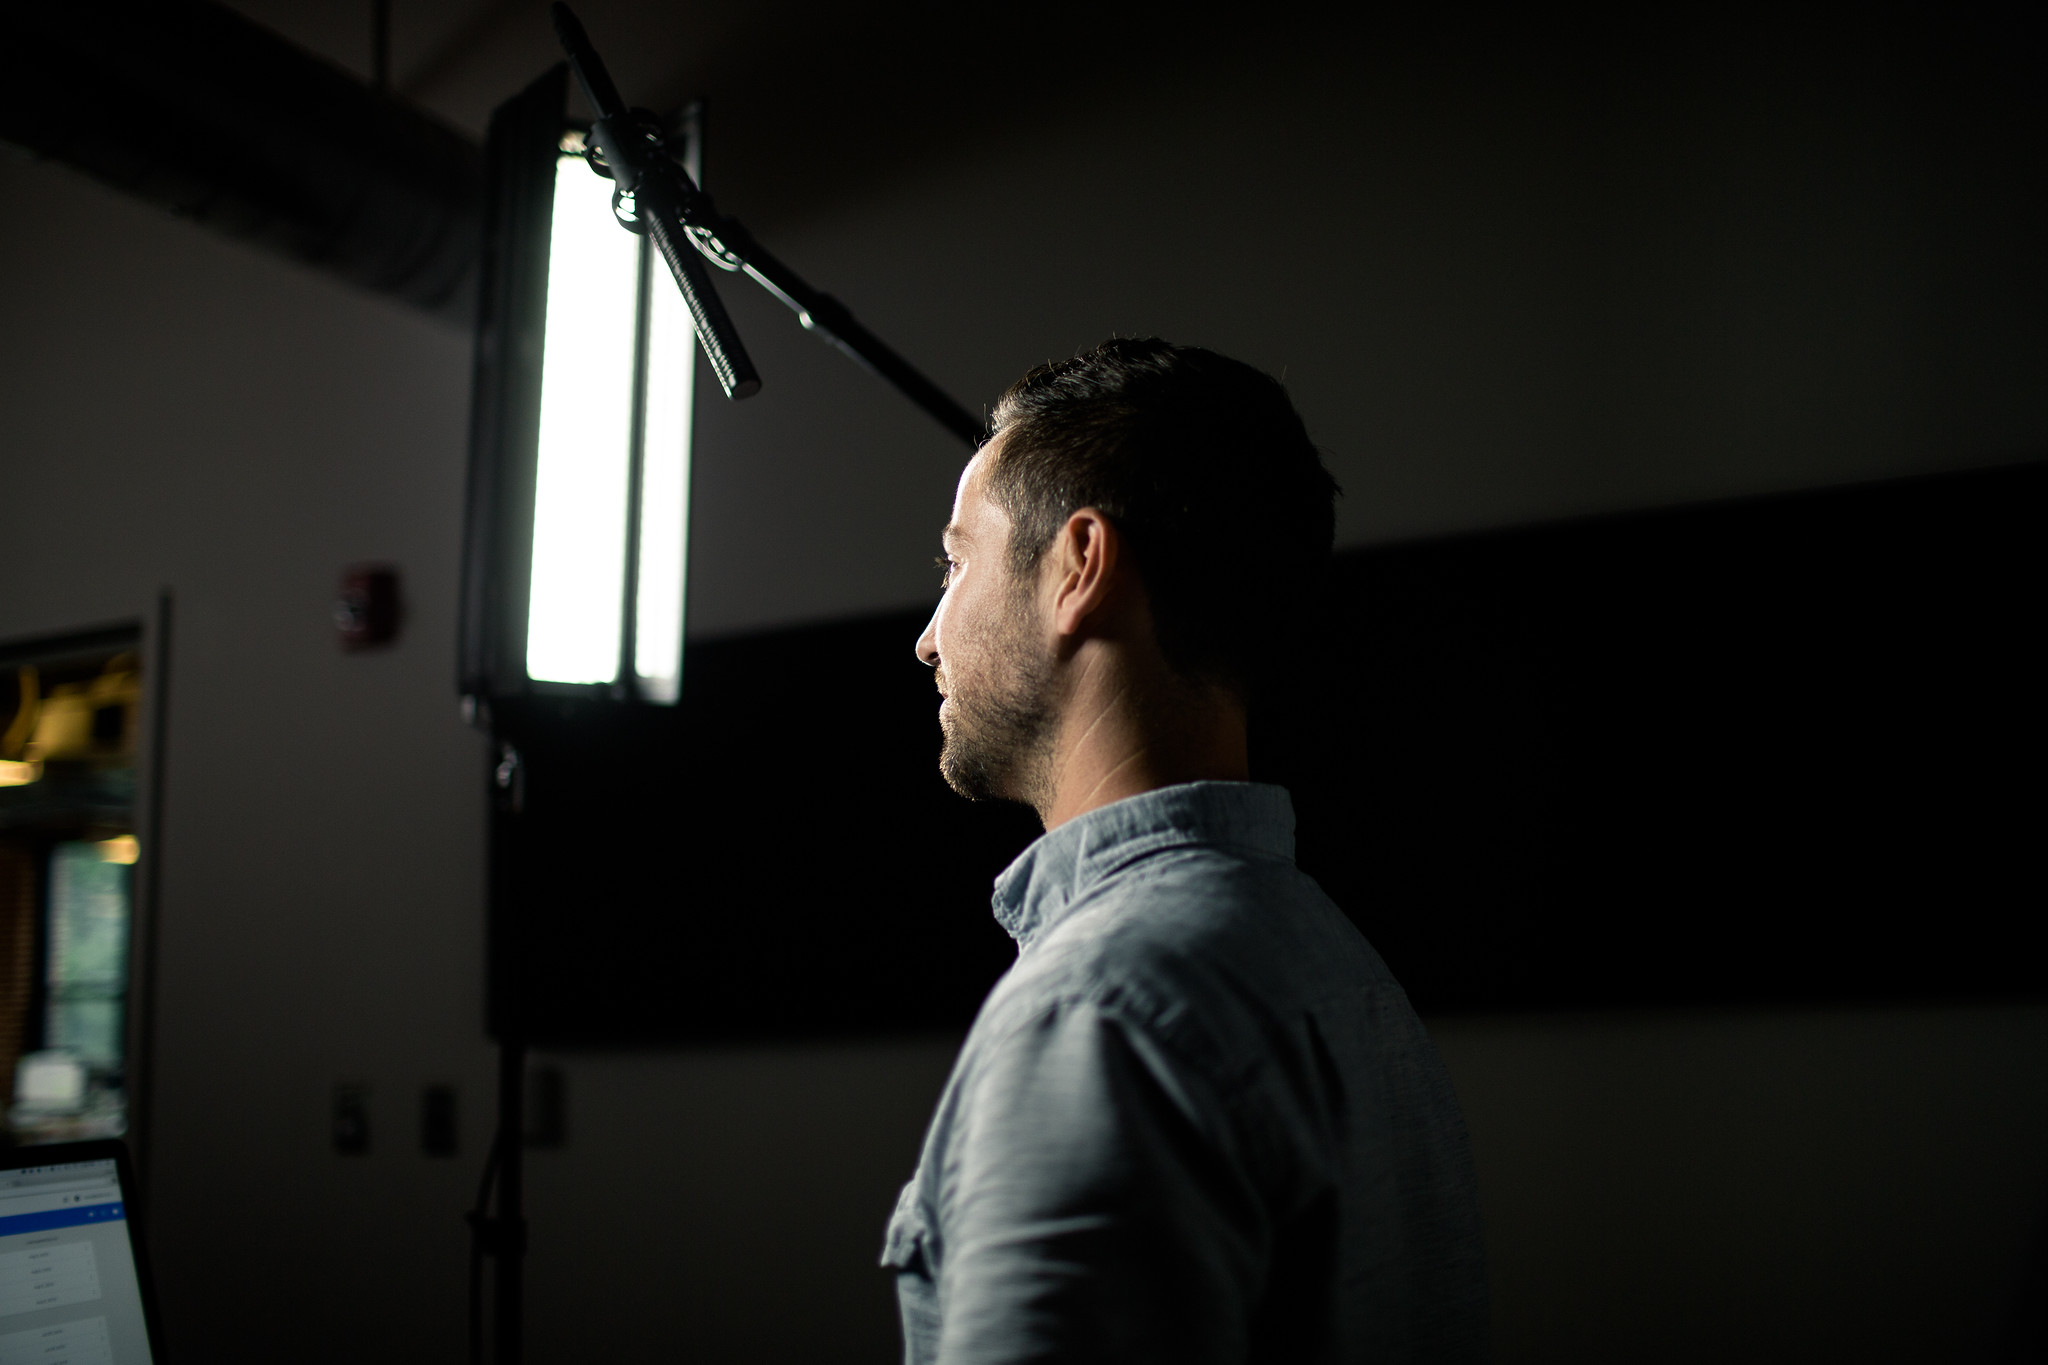 Use Studio Lights